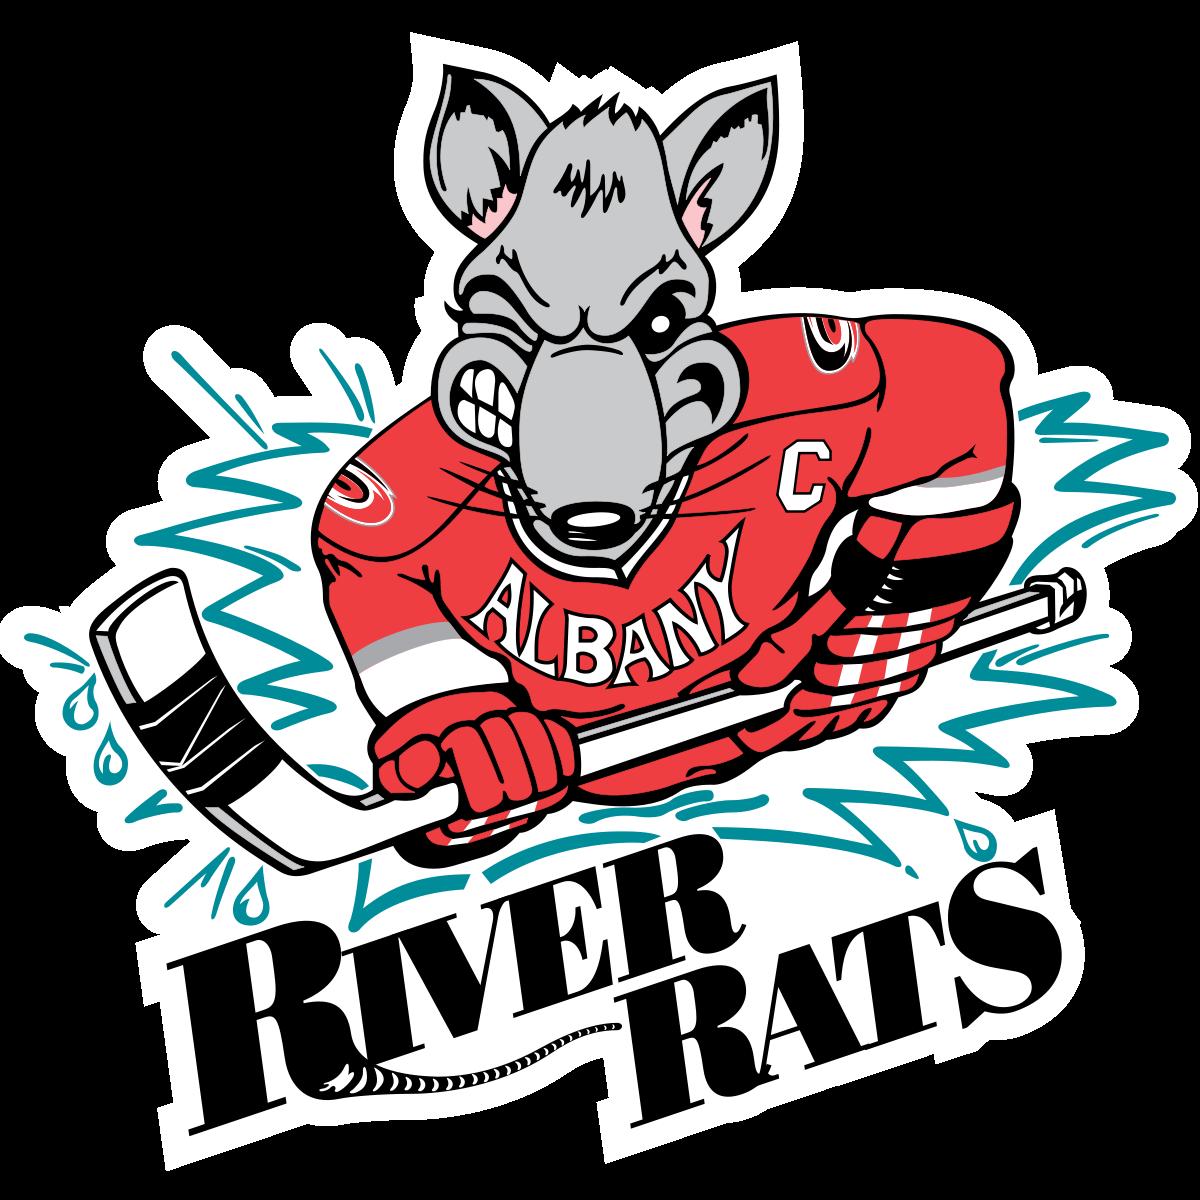 Tough guy rat clipart jpg Albany River Rats - Wikipedia jpg